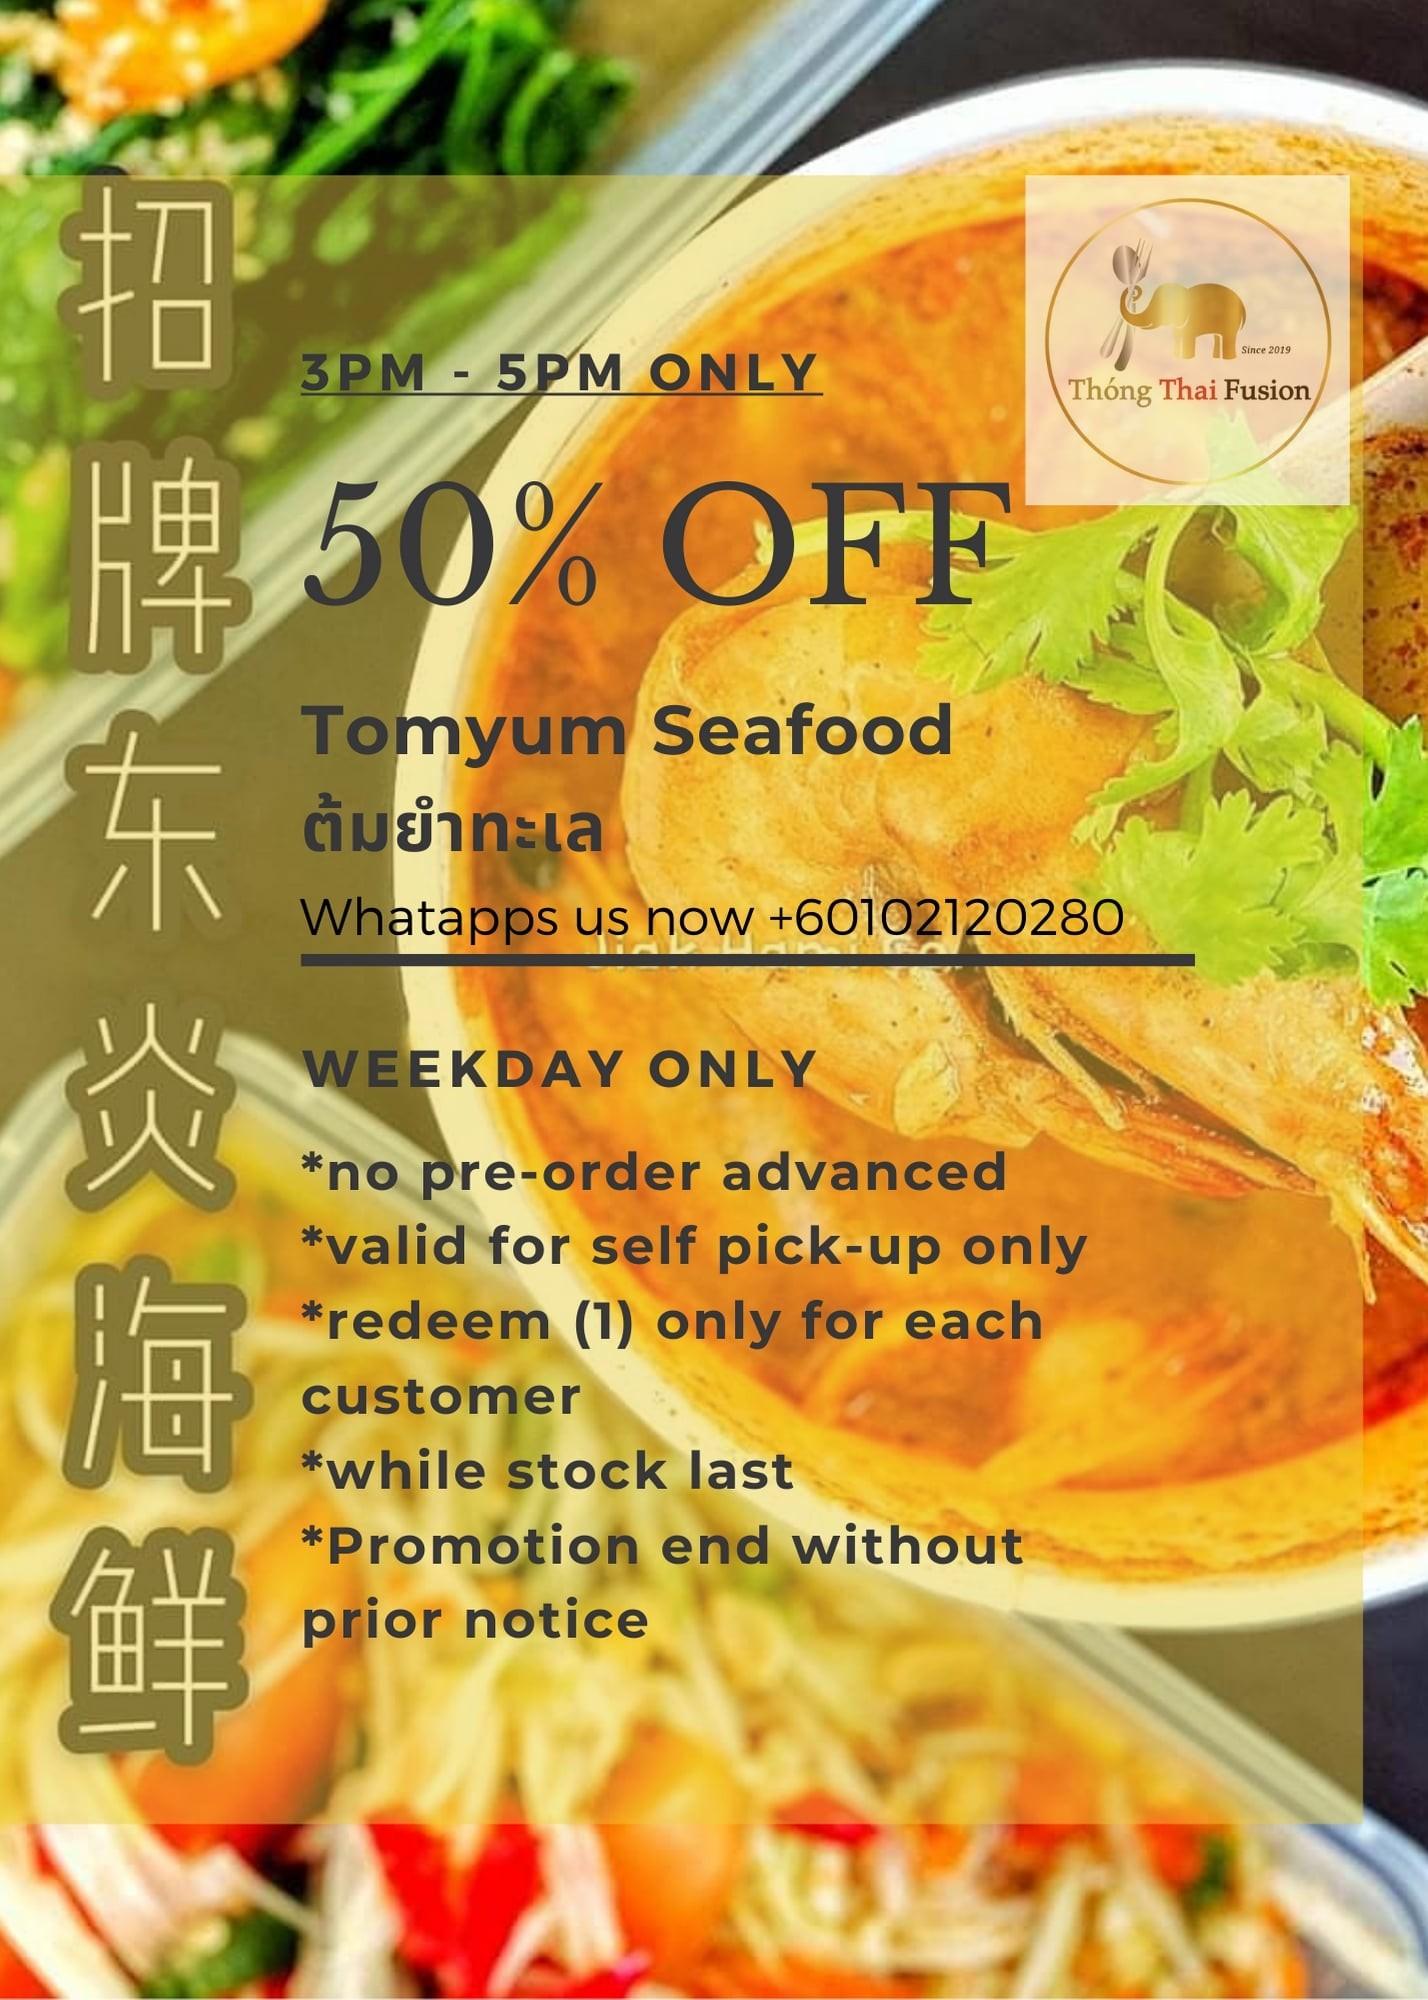 Tomyum Seafood by Thong Thai Fusion